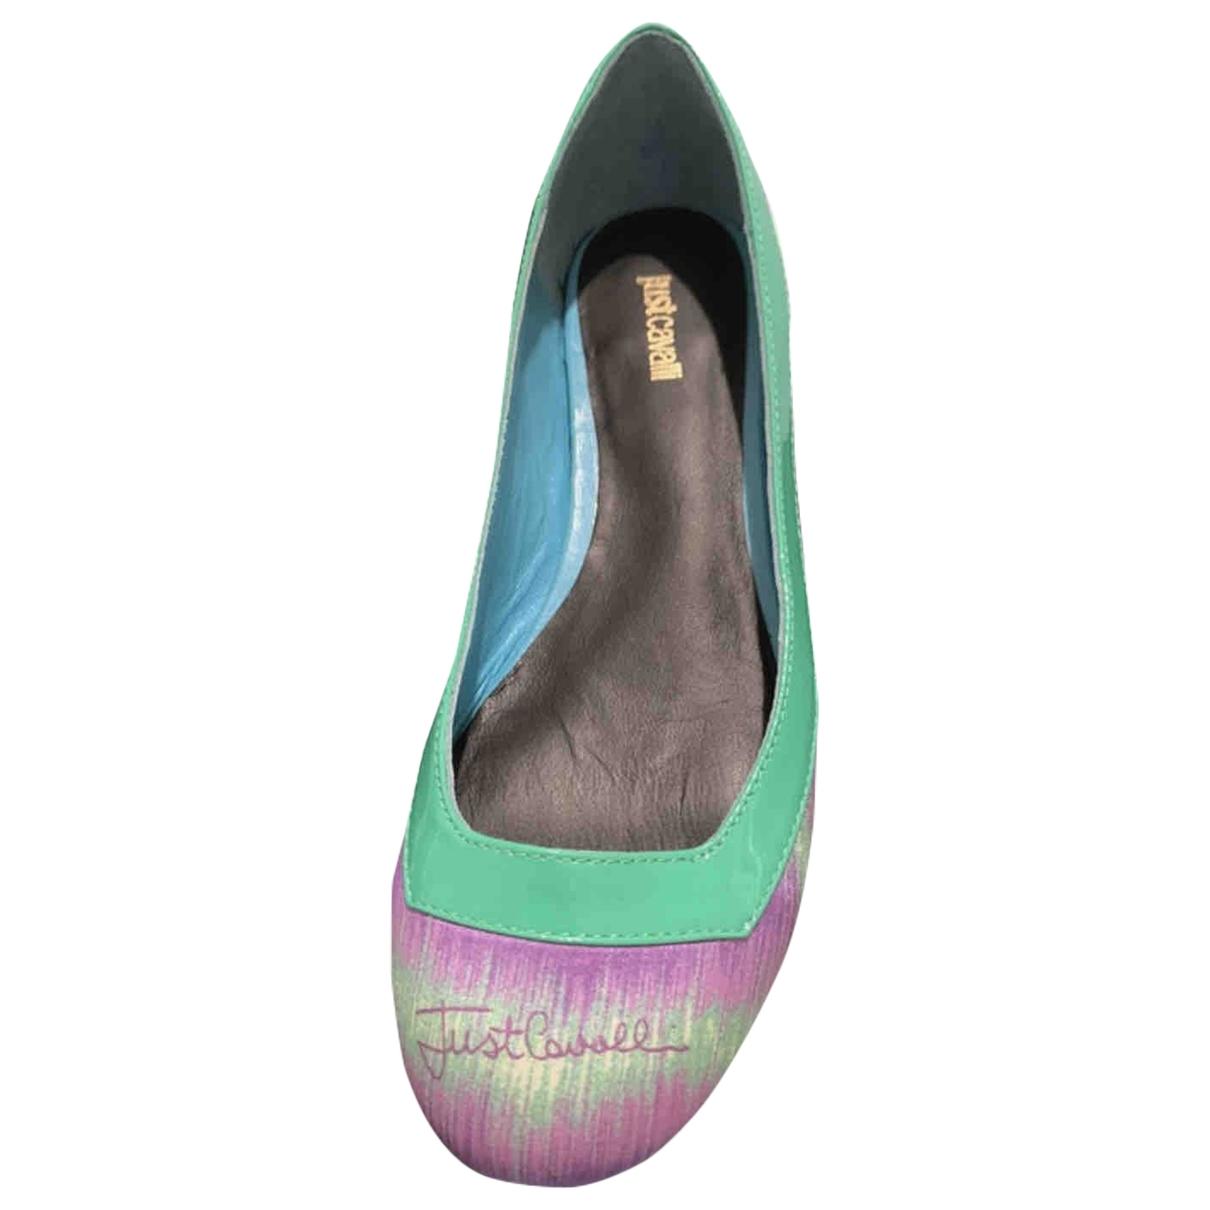 Just Cavalli - Ballerines   pour femme en cuir verni - turquoise